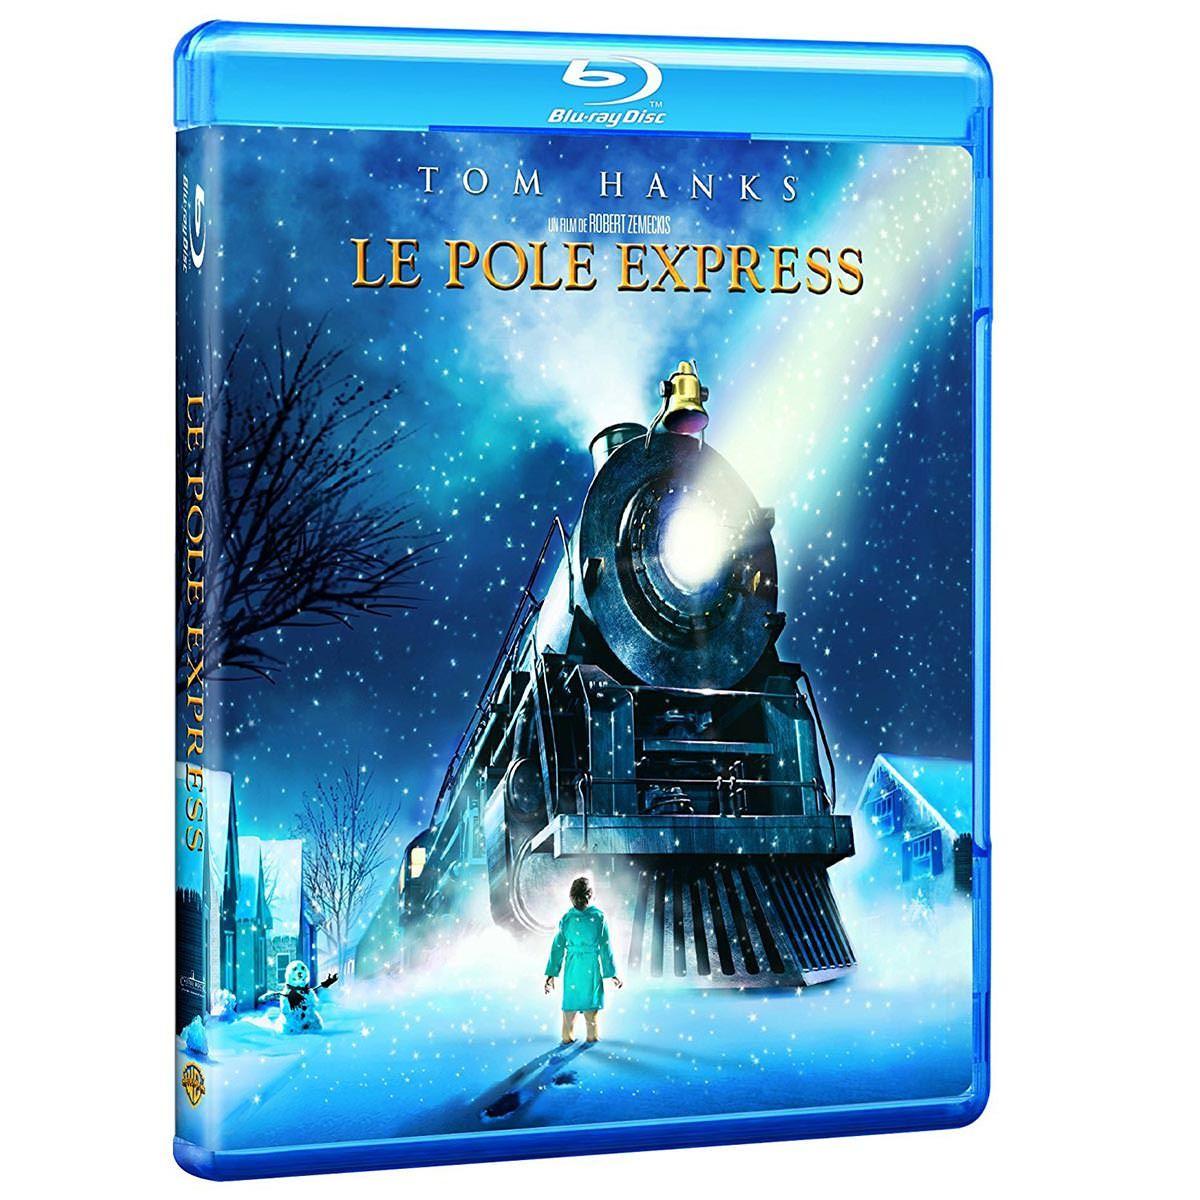 Le Pôle Express Urlaubsfilme, Kinder filme, Weihnachtsfilme